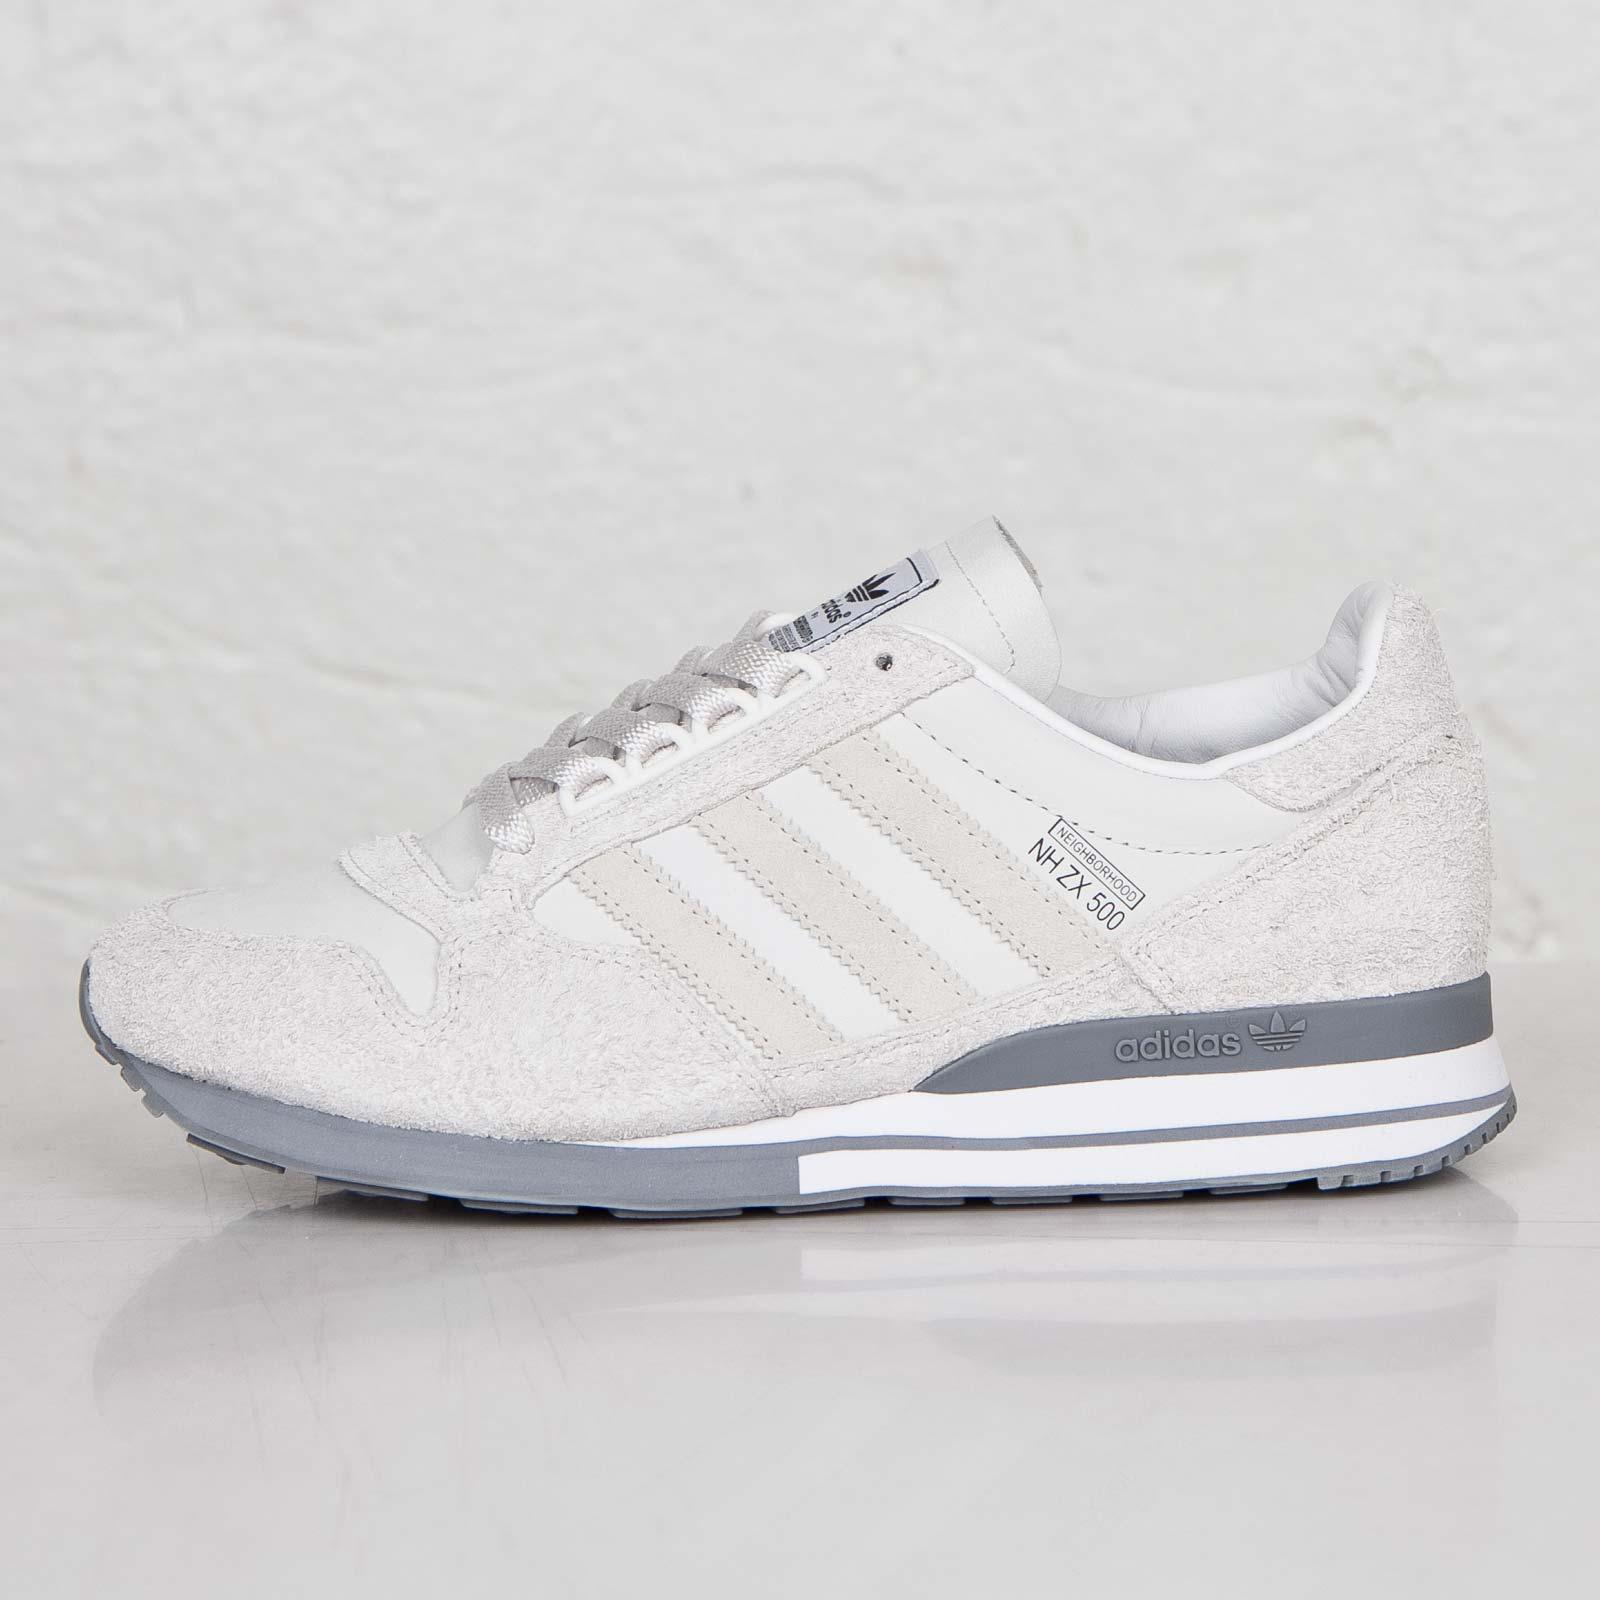 ee3d4cafed8d87 adidas NH ZX 500 OG - B26088 - Sneakersnstuff